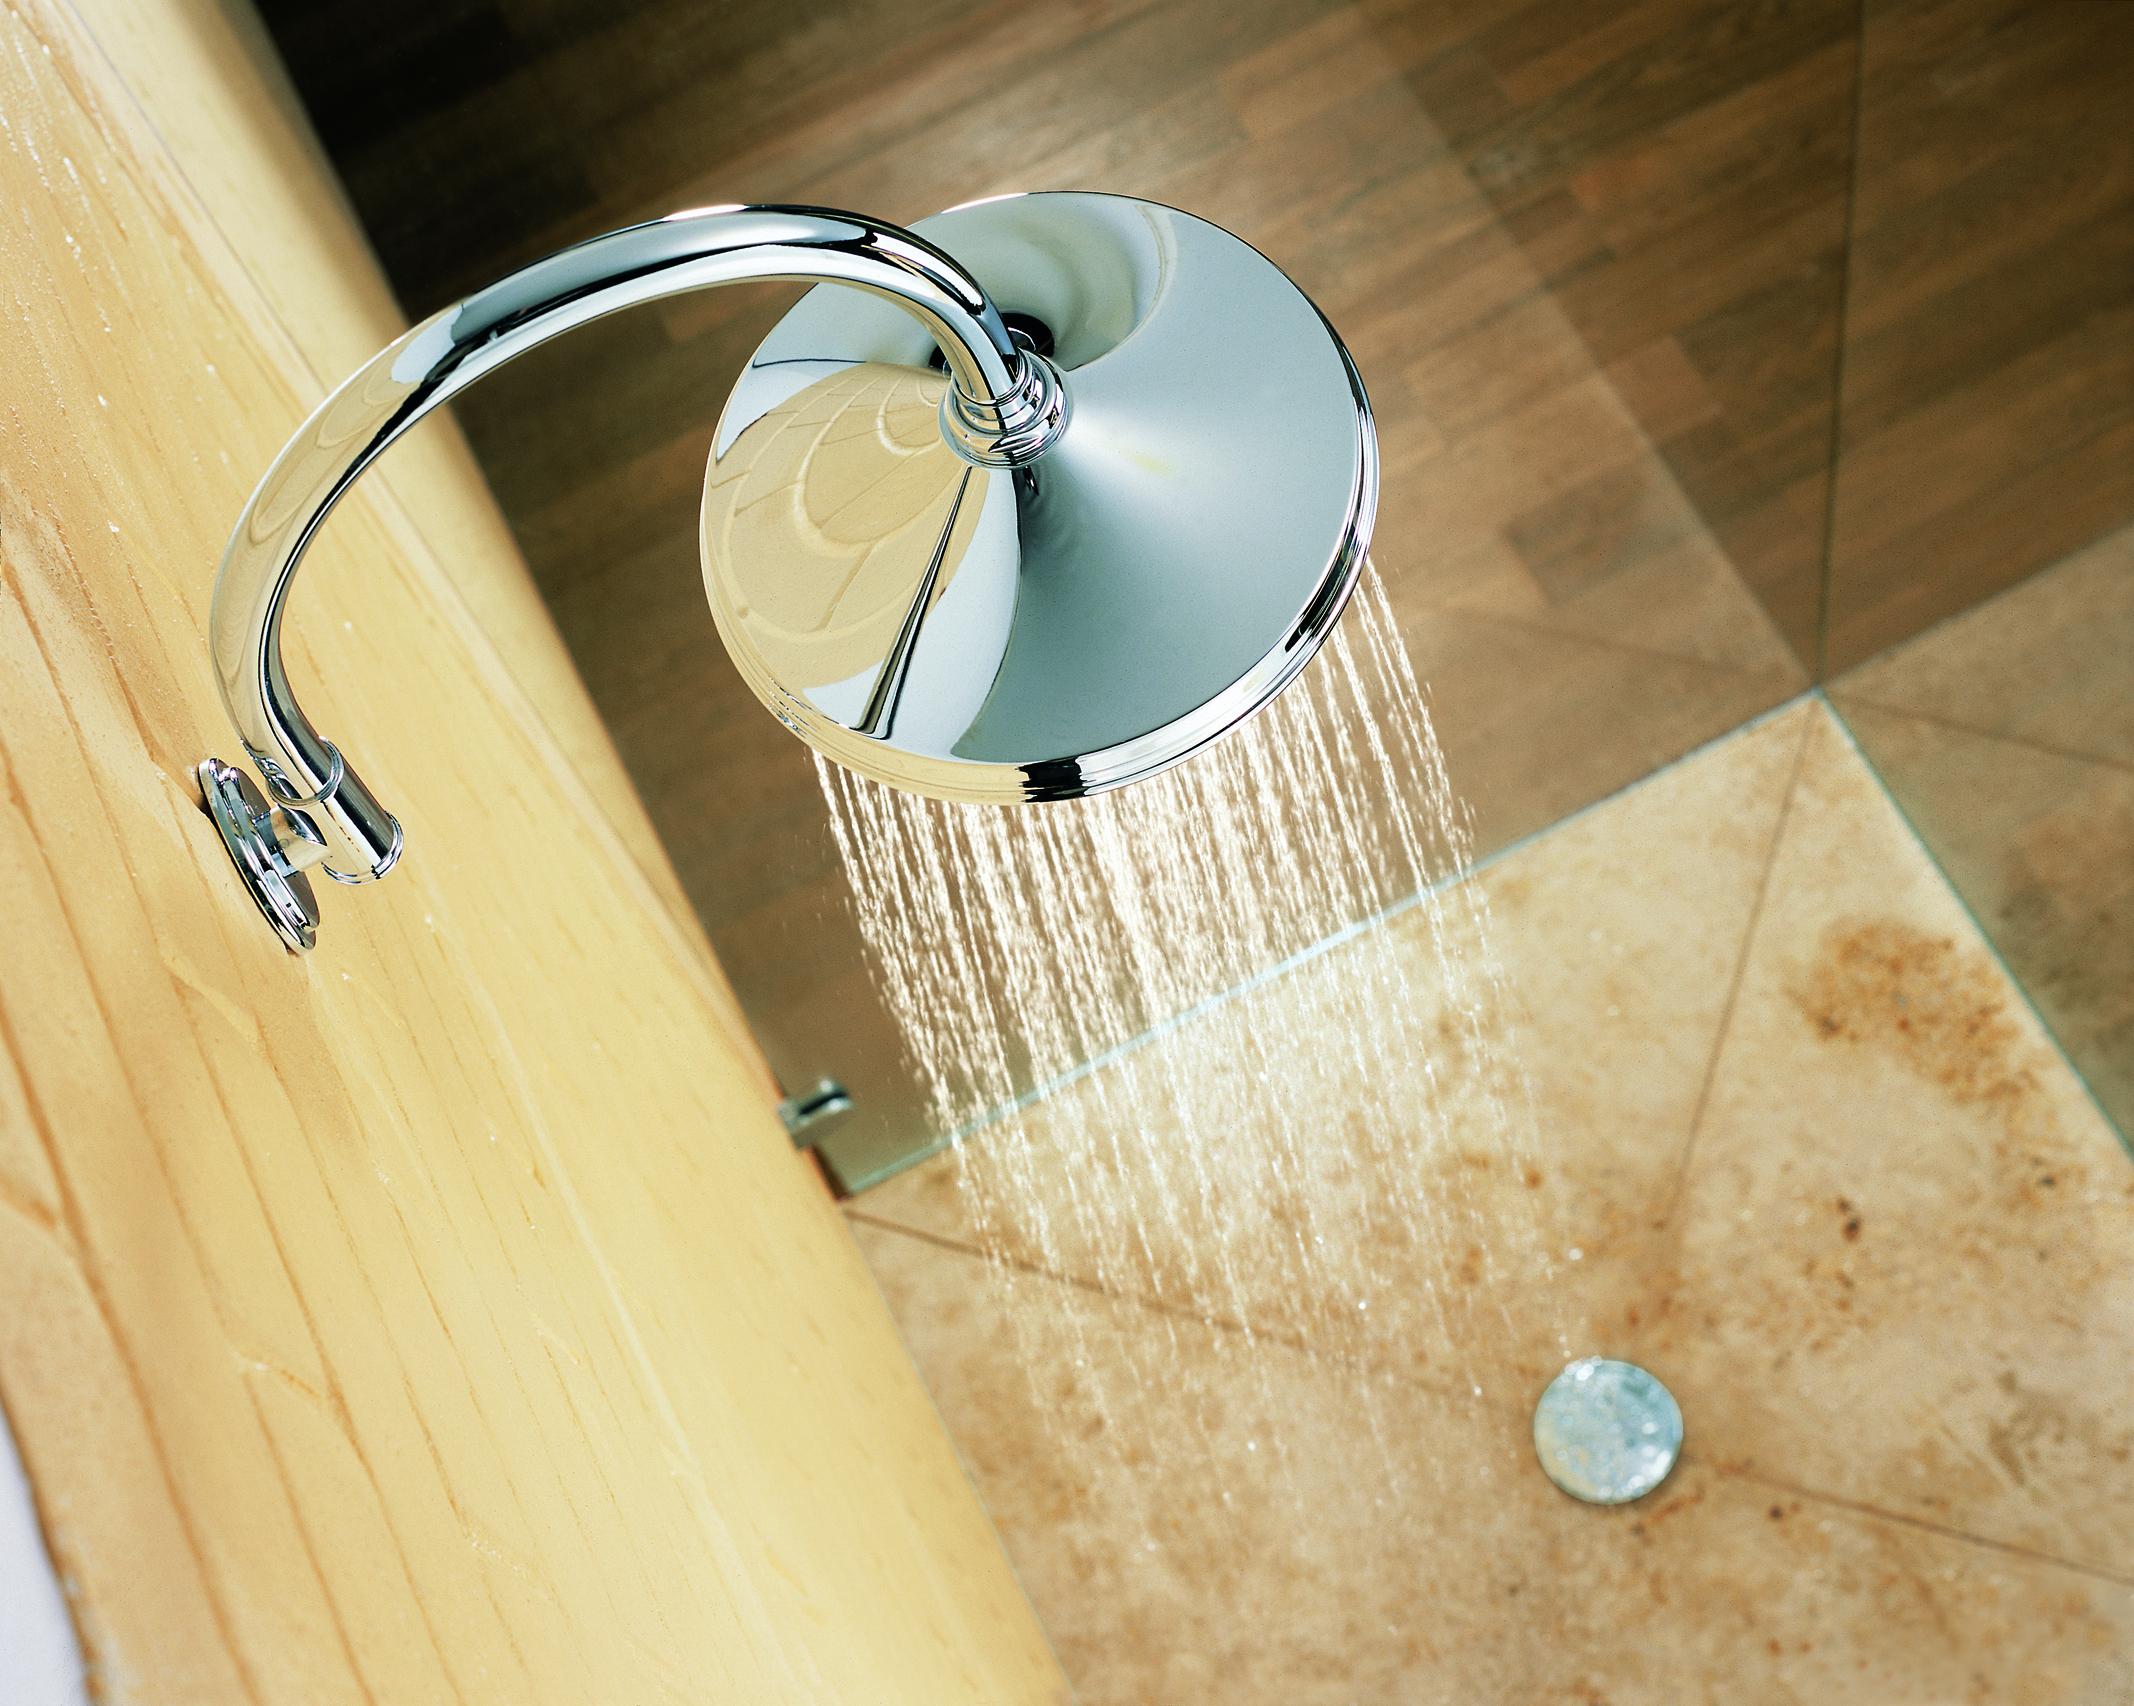 Grohe's Bathroom Showers